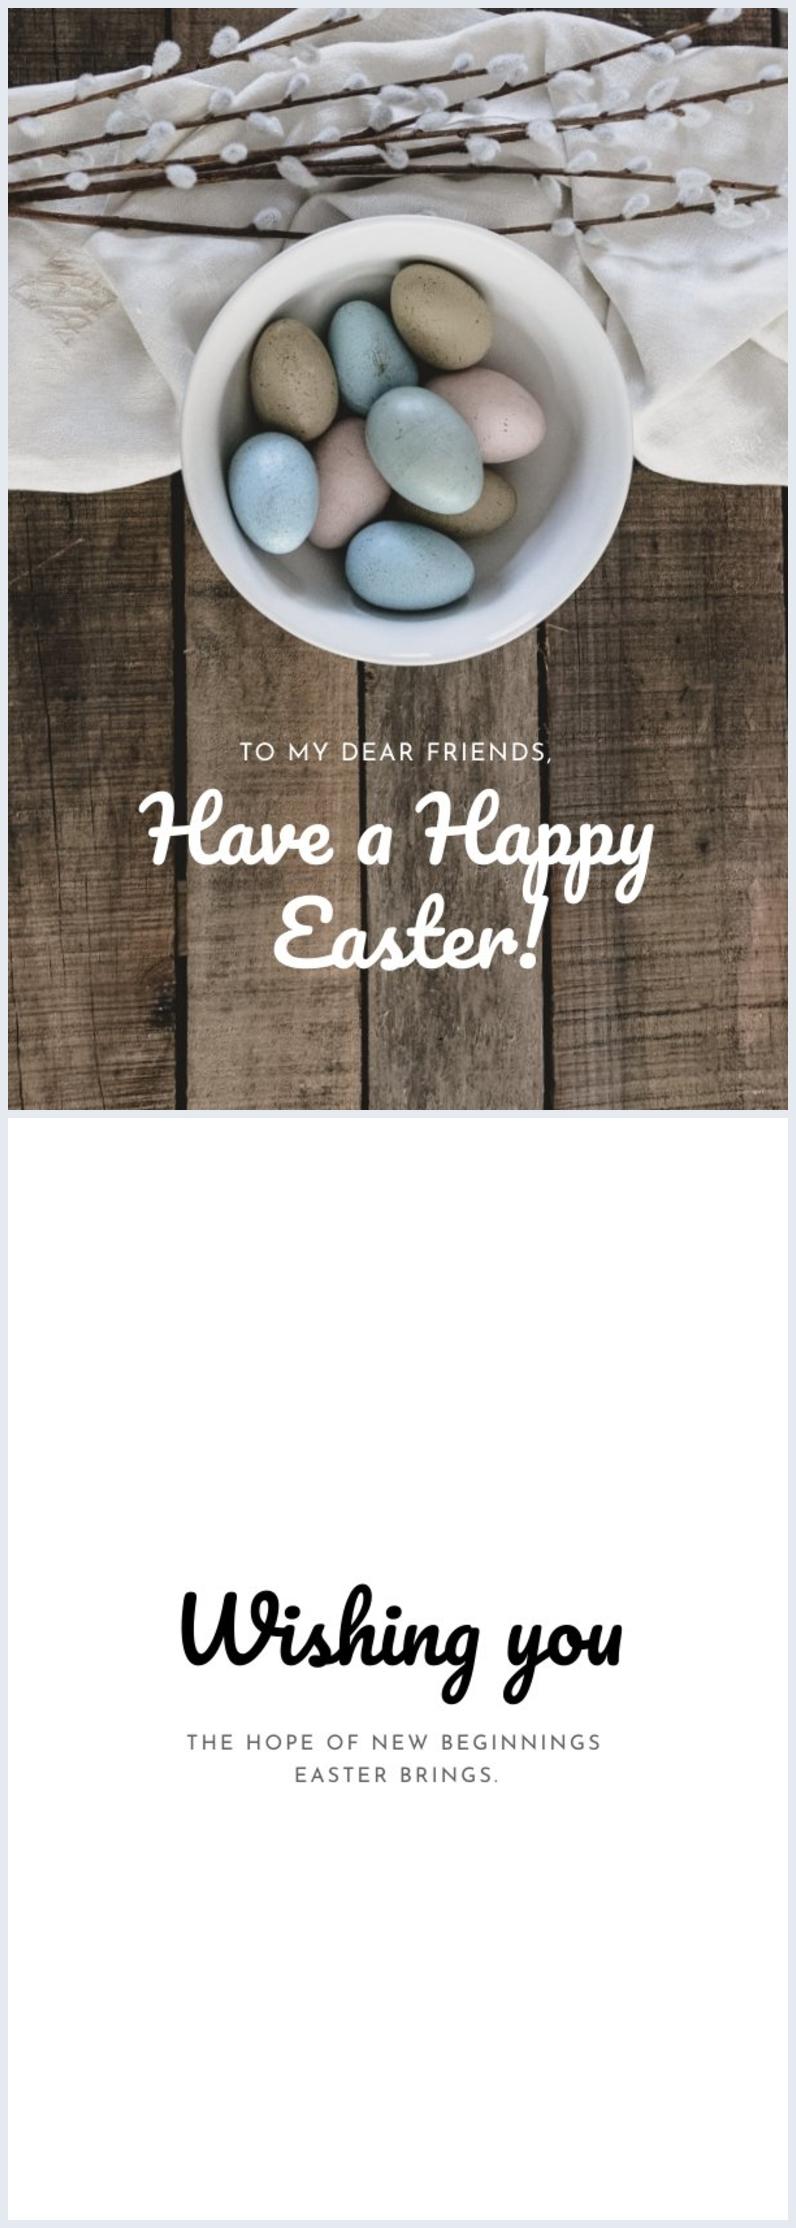 Customizable Easter Card Design